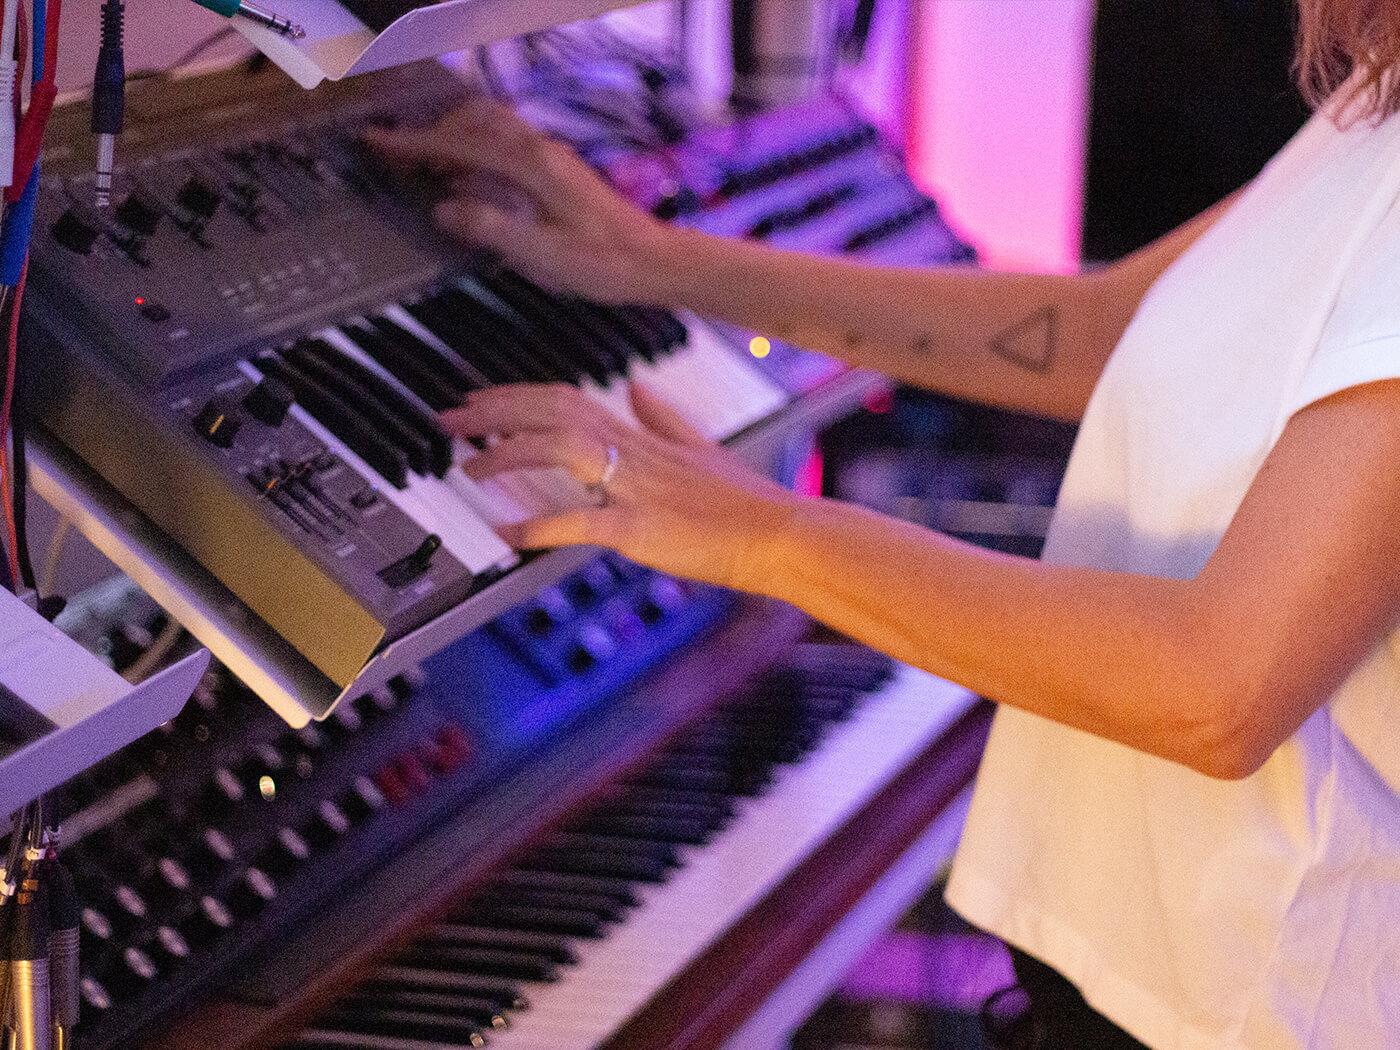 Francesca Lombardo with Roland SH-101